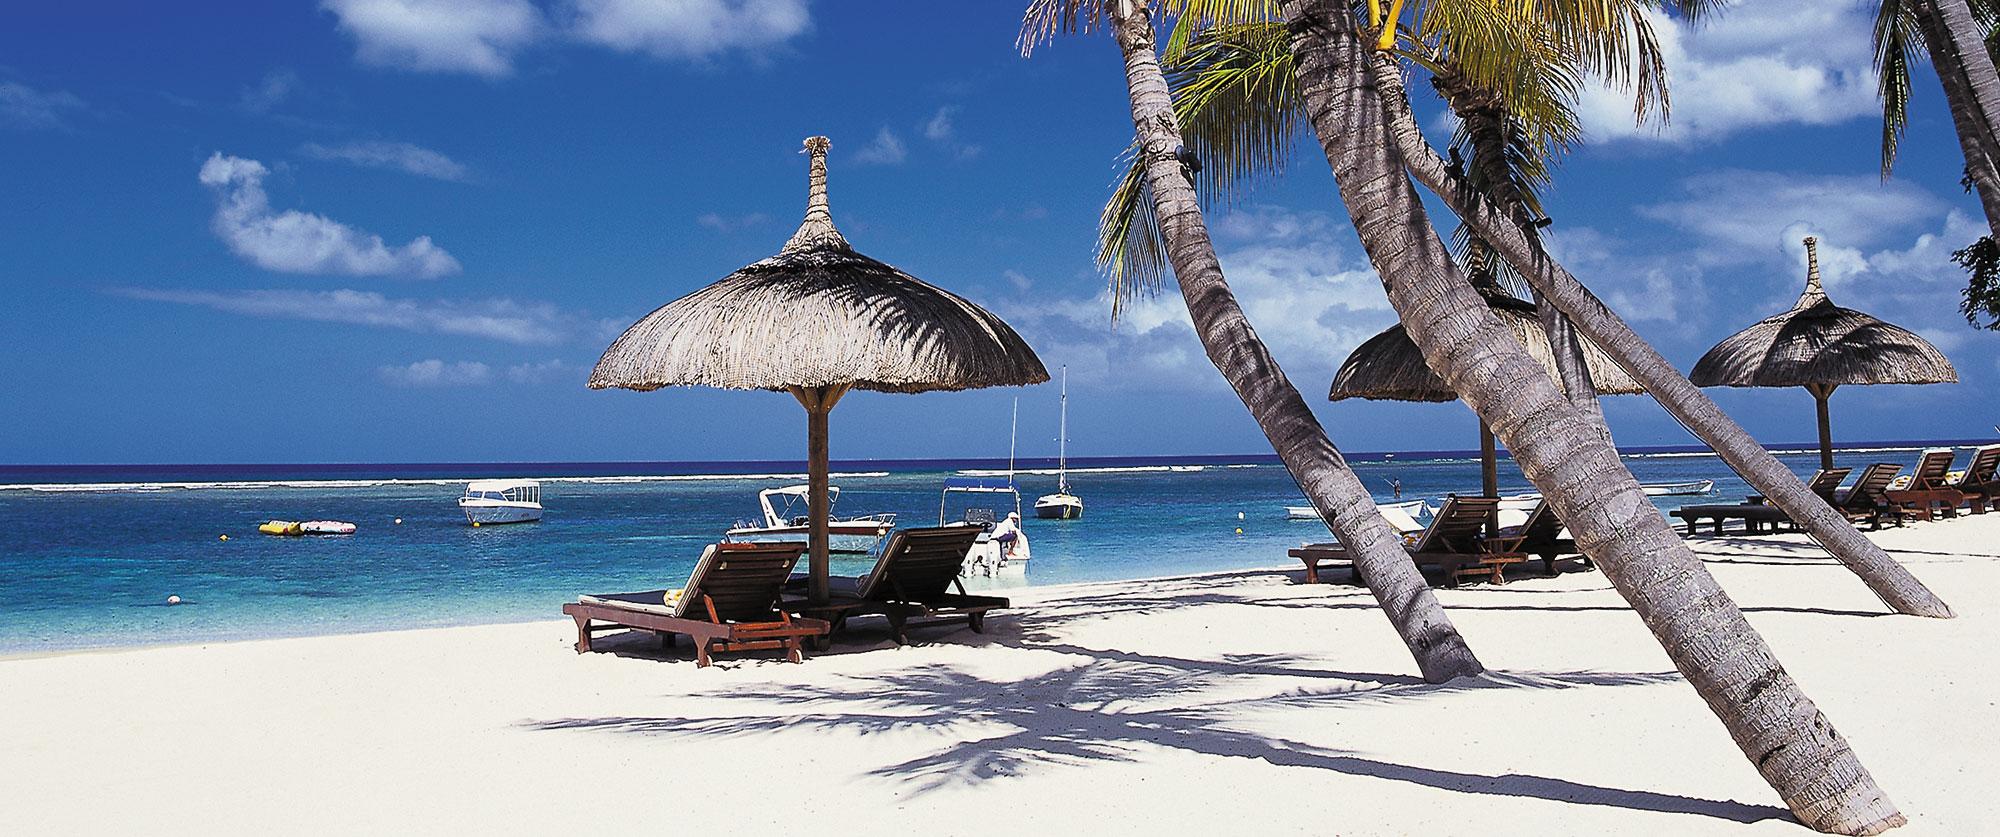 Mauritius - Travel Specialist - Vacation - Getaway